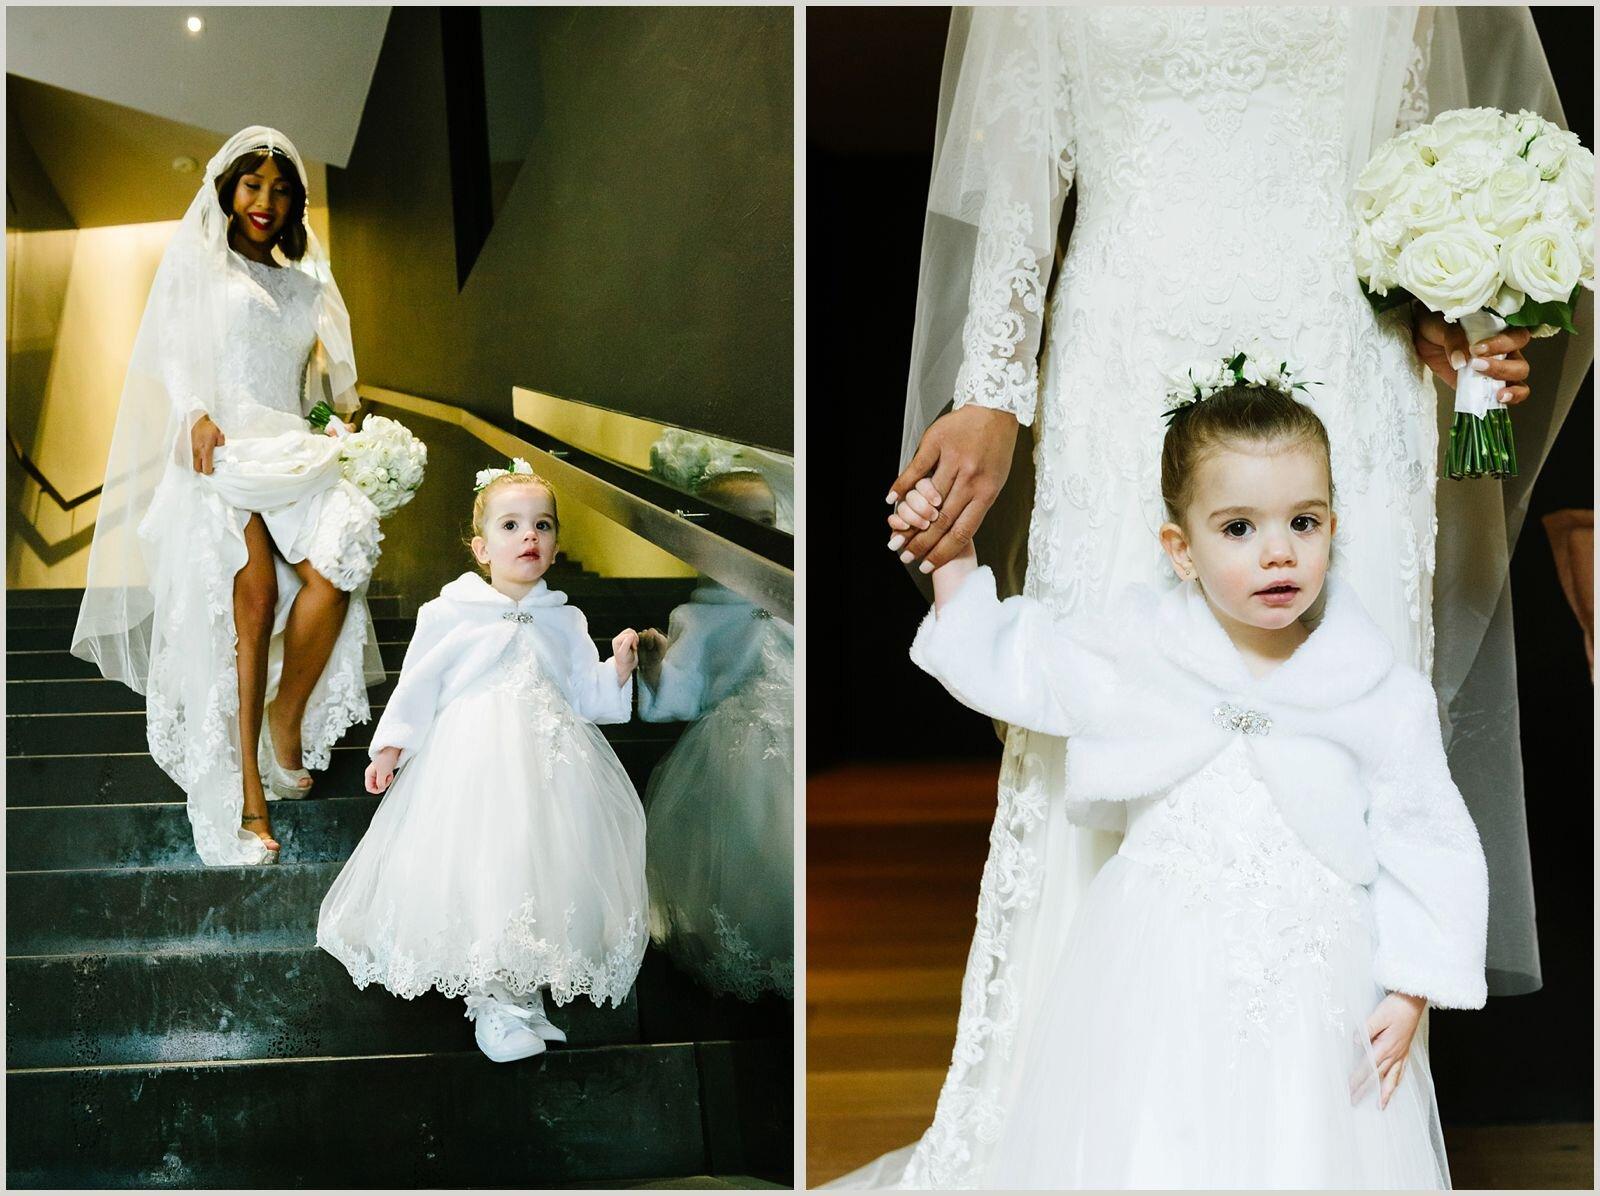 joseph_koprek_wedding_melbourne_the_prince_deck_0038.jpg